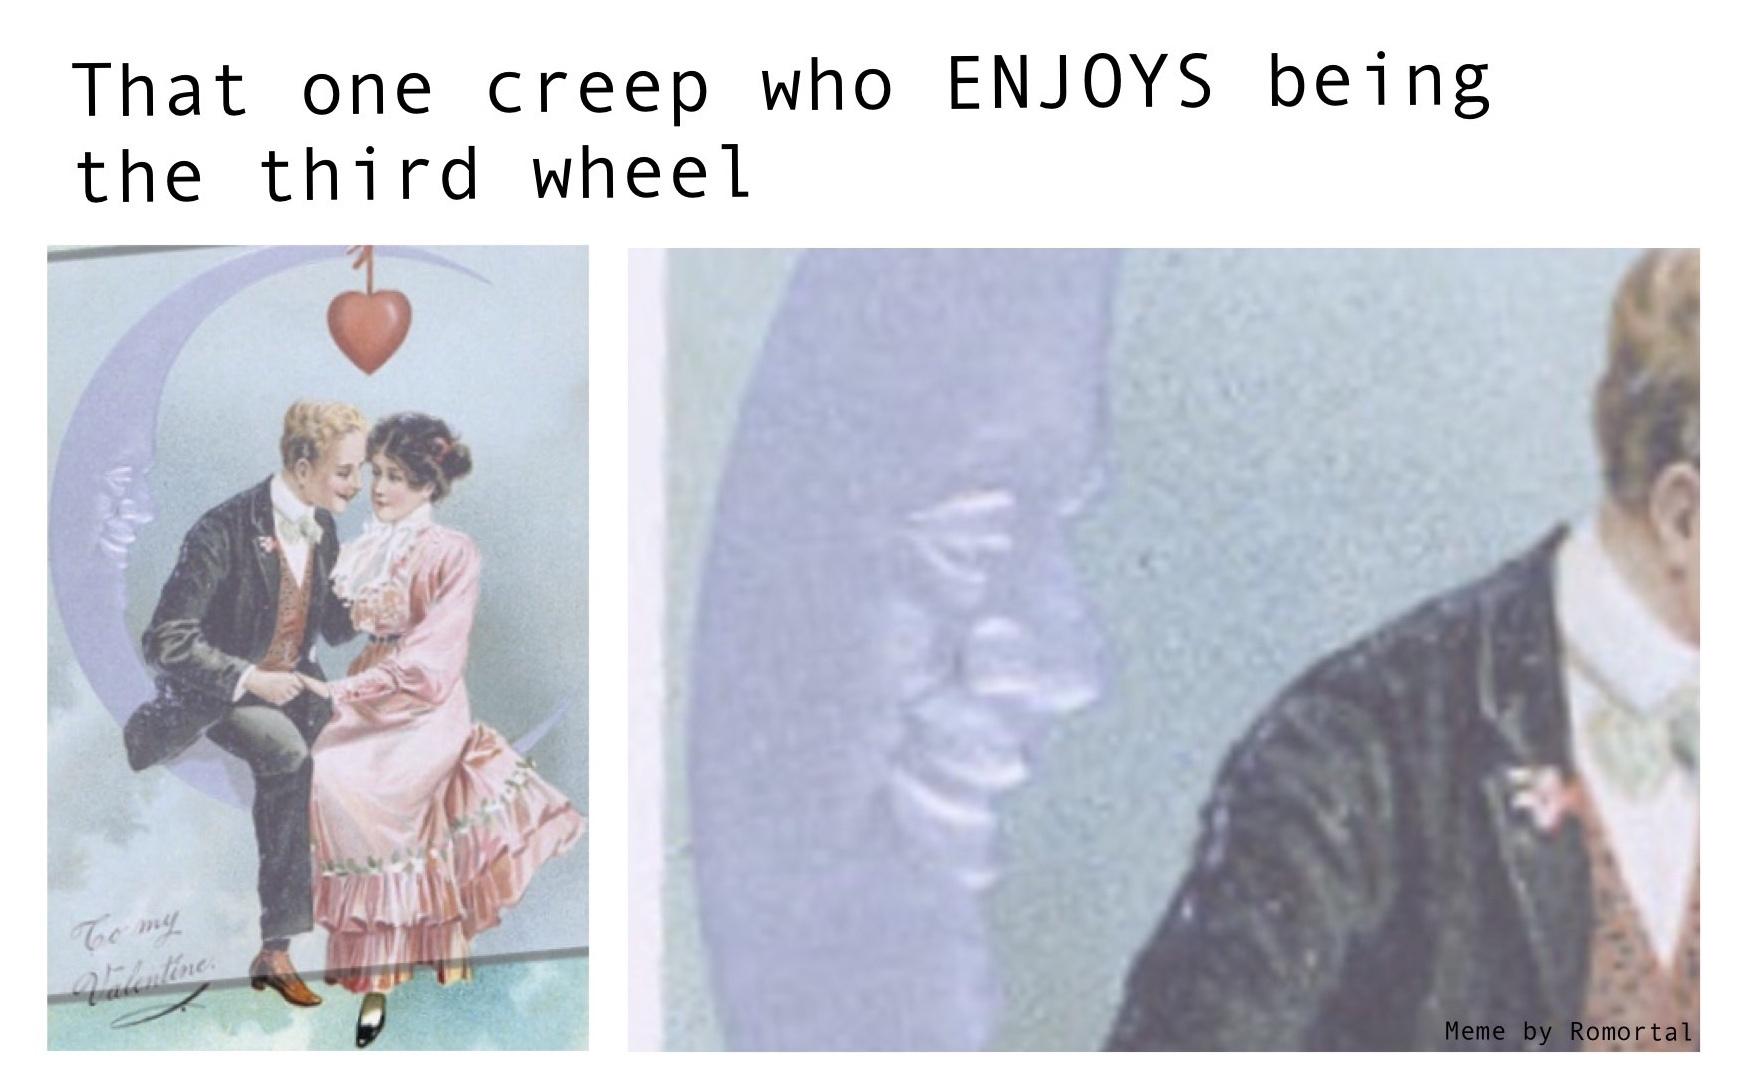 That one creep... - meme